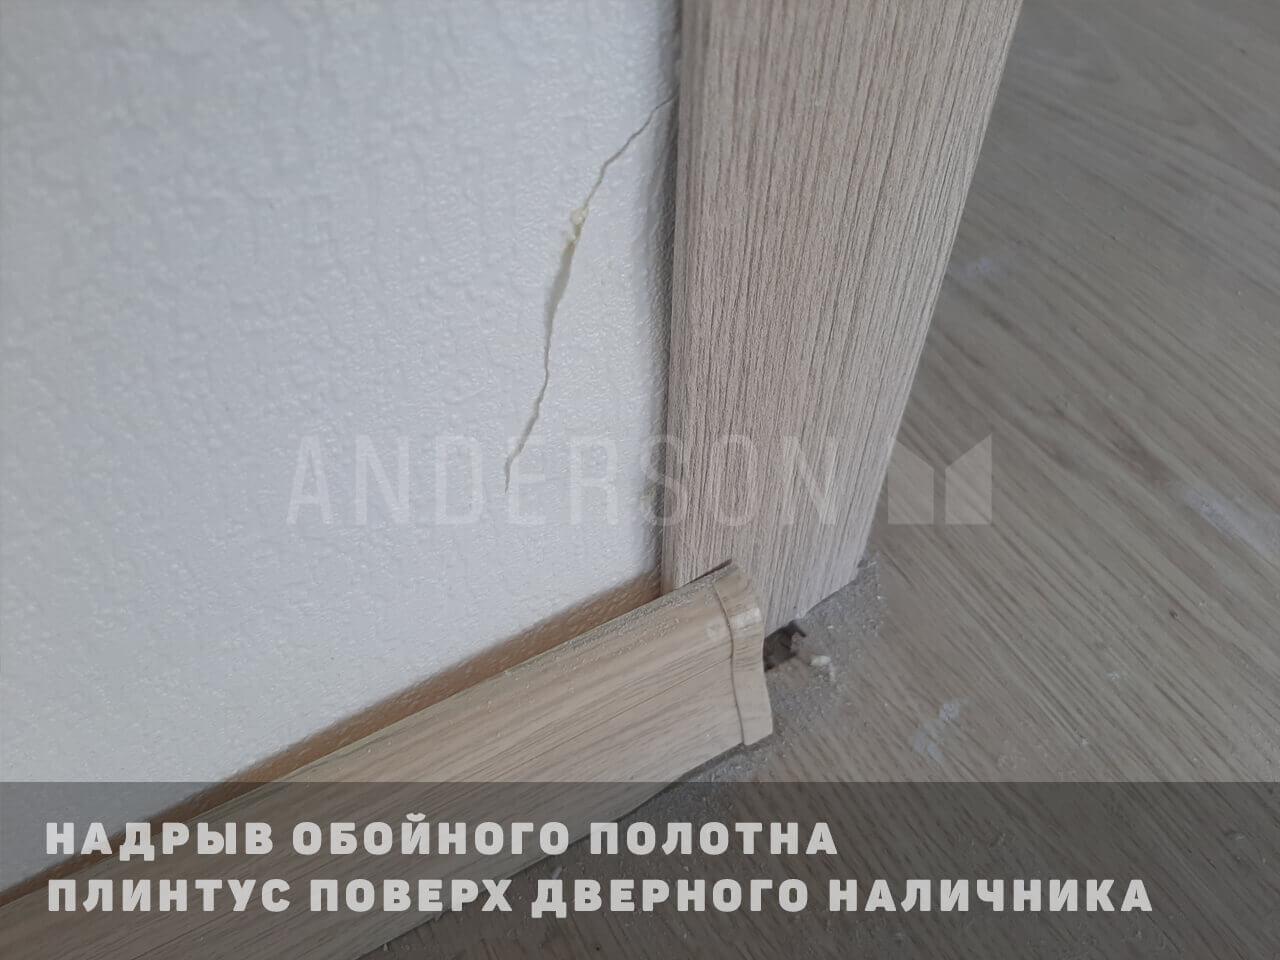 Плинтус поверх дверного наличника